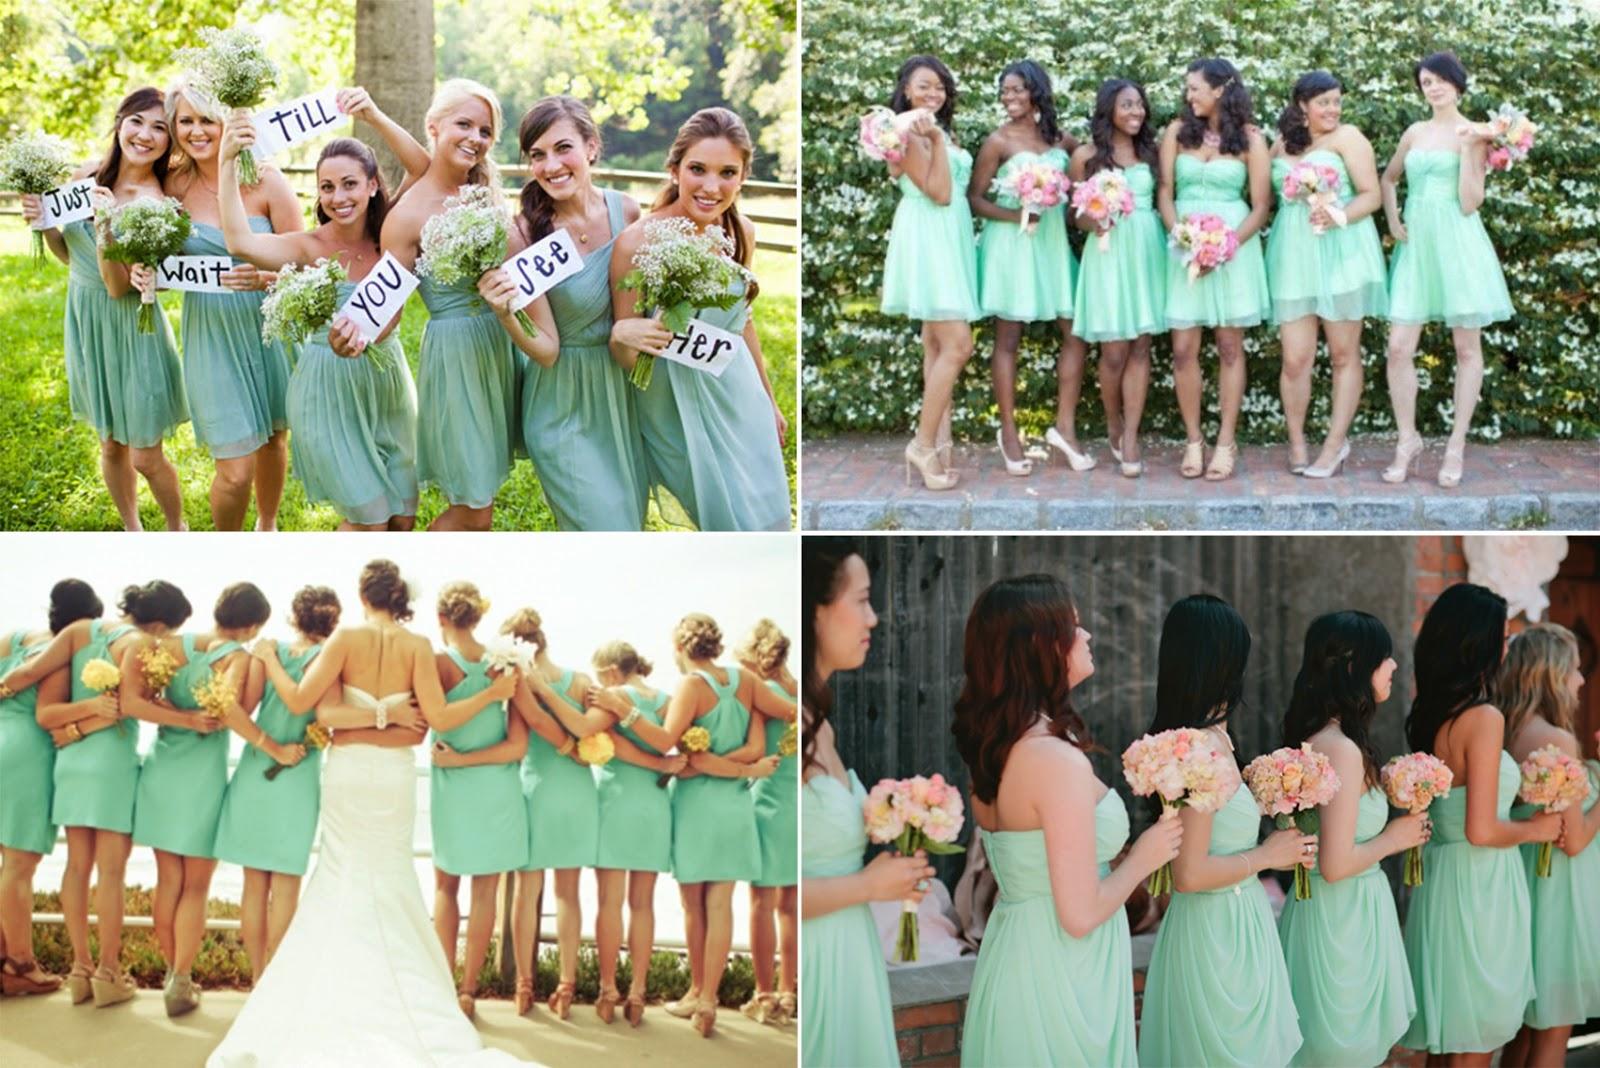 inspiring mint green wedding ideas mint wedding dress If you love white wedding dress better than mint wedding dress mint bridesmaid dresses are necessary for your wedding Whatever long or short bridesamaid